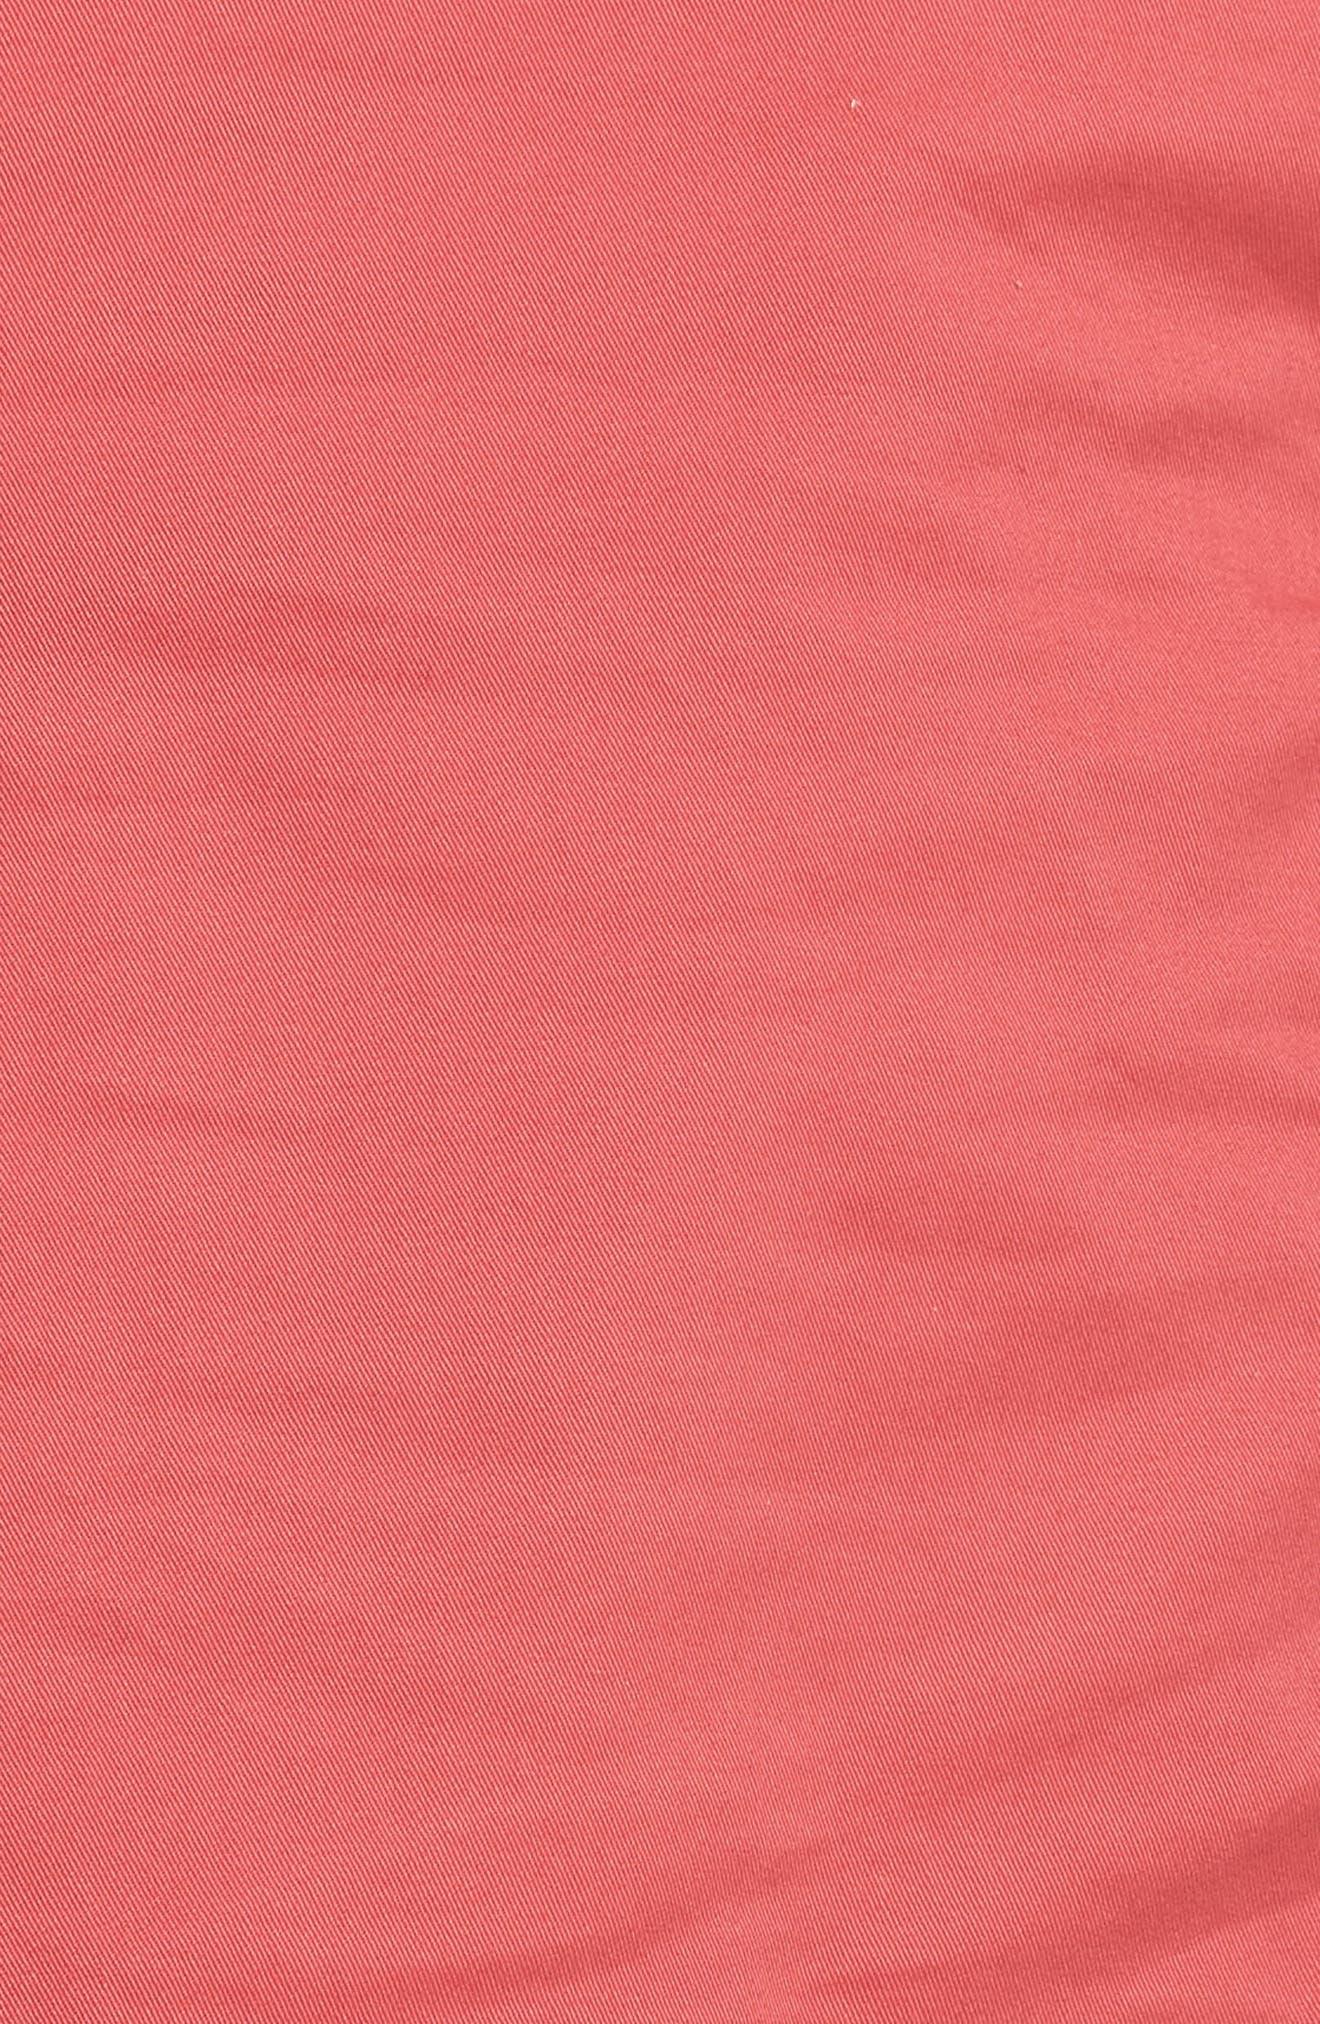 Ballard Slim Fit Stretch Chino 11-Inch Shorts,                             Alternate thumbnail 74, color,